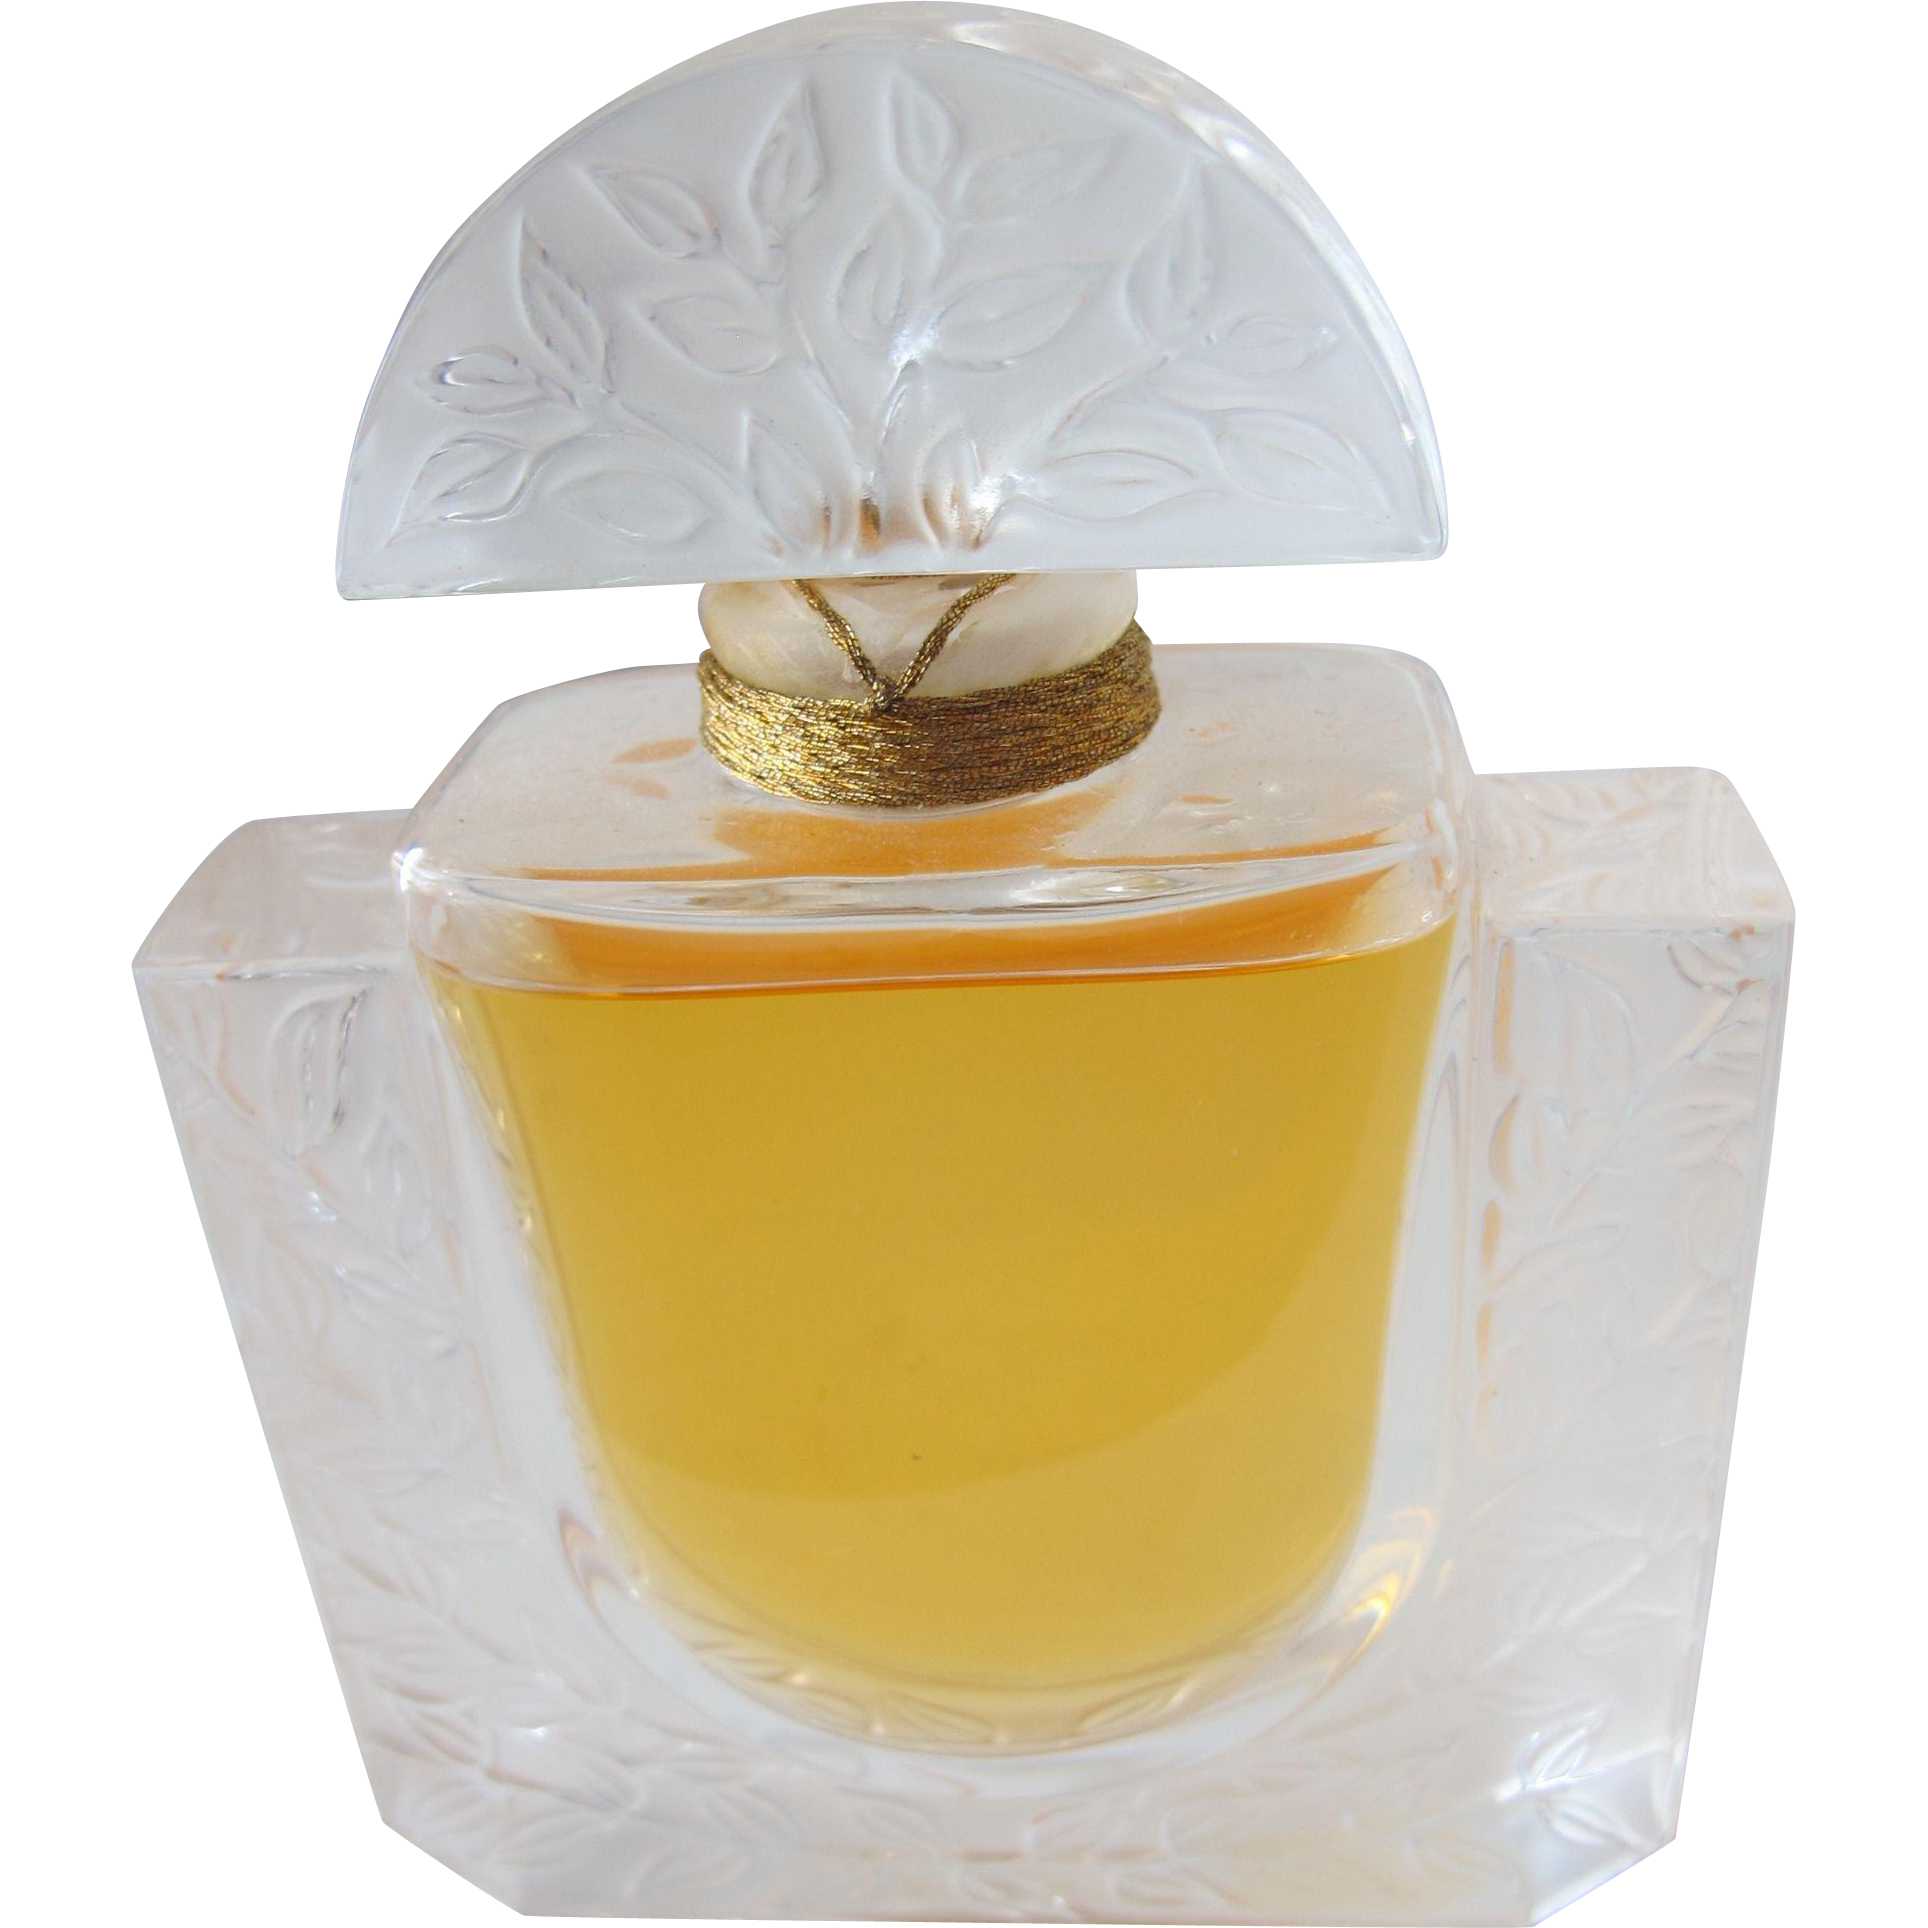 Vintage Perfume Bottle Lalique Chevrefeulle Crystal Factice Parfum Perfume Display Bottle